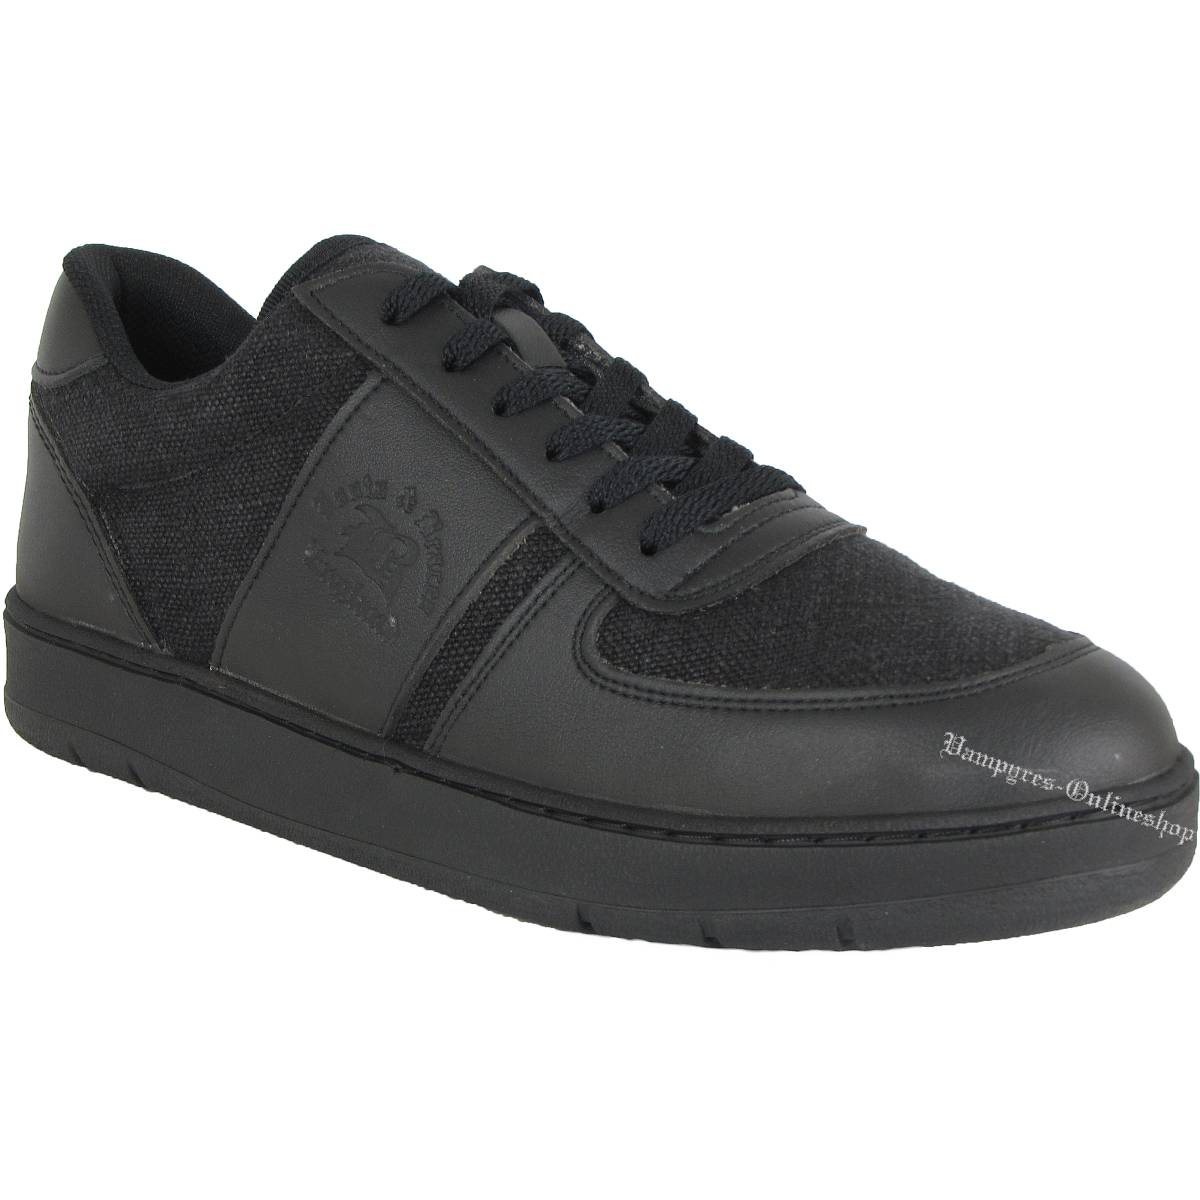 Boots & Braces Sneaker Vegetarian Schwarz Schuhe Vegan Freizeitschuh